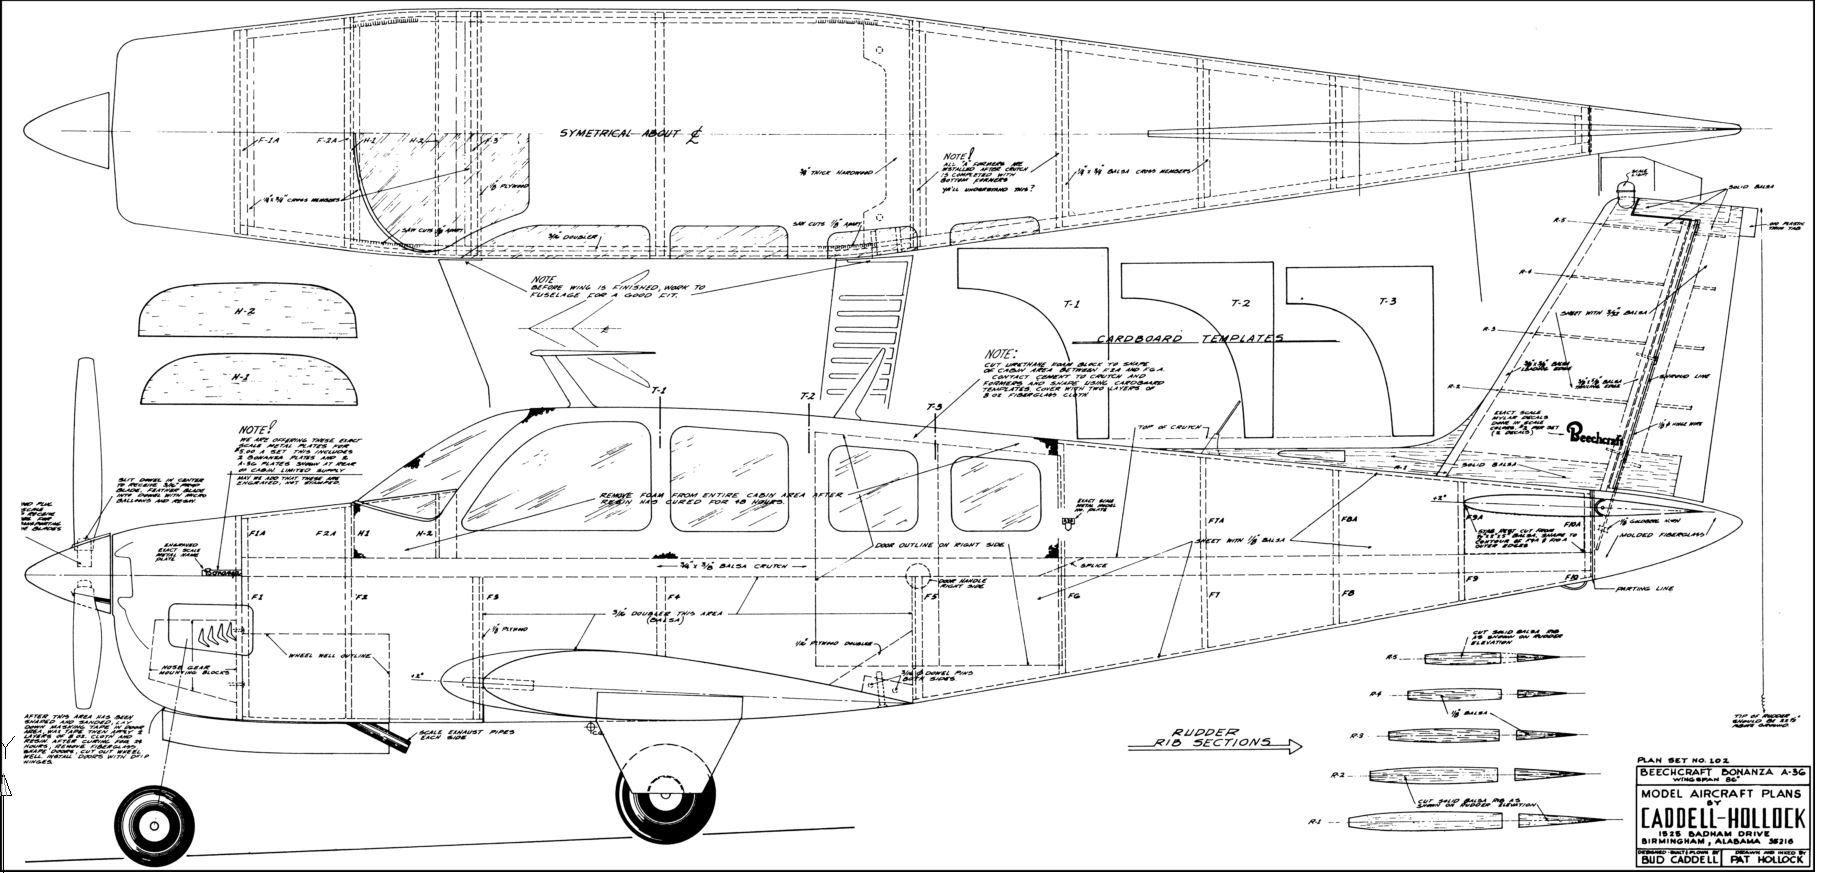 Click image for larger version  Name:Bonanza A-36 plan.JPG Views:587 Size:256.9 KB ID:2204784